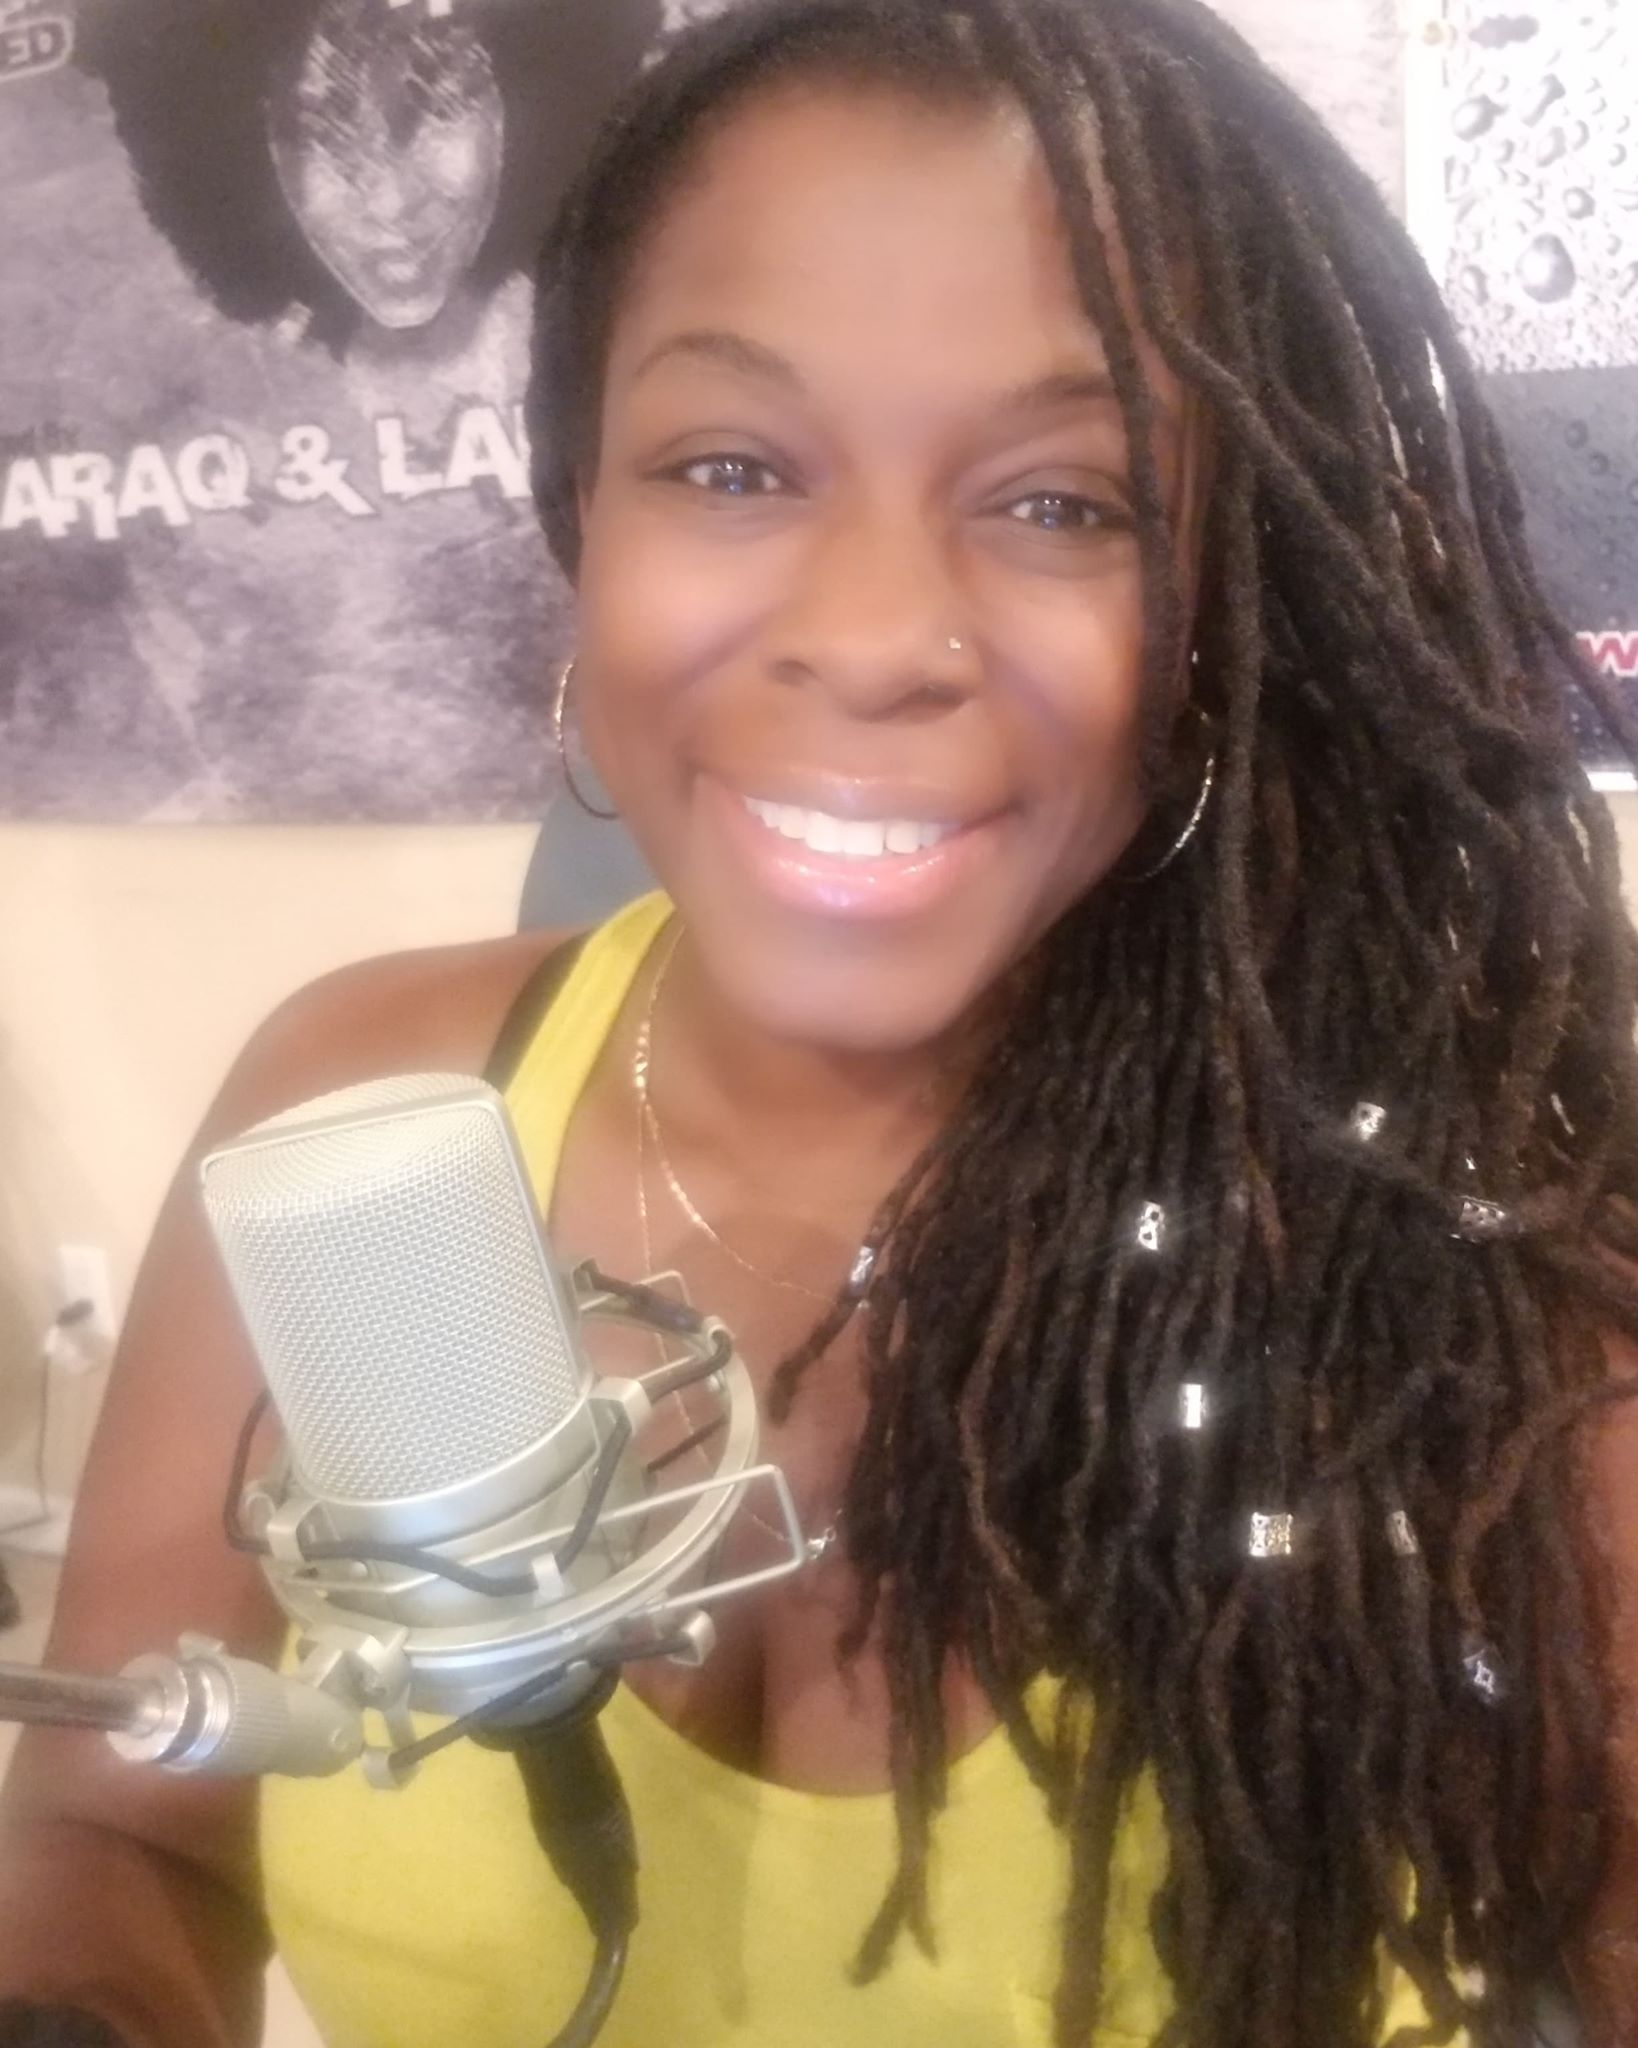 LaRaq, The Sistahood Radio